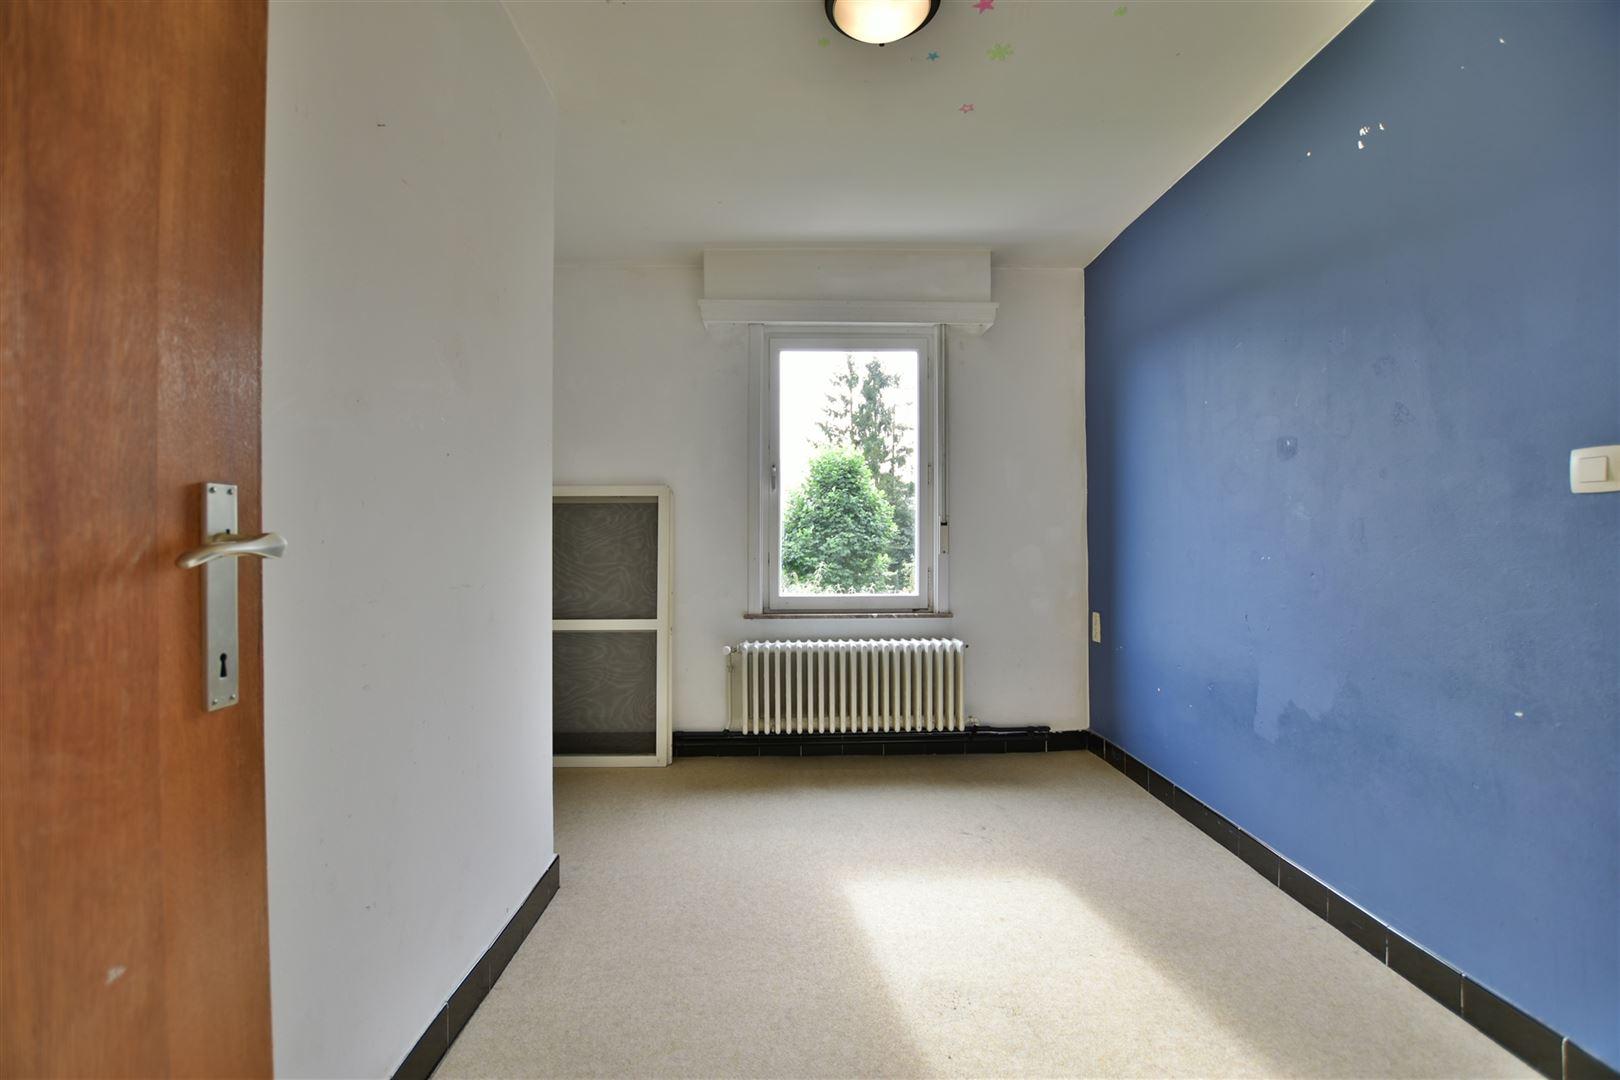 Foto 12 : Woning te 9100 SINT-NIKLAAS (België) - Prijs € 349.000